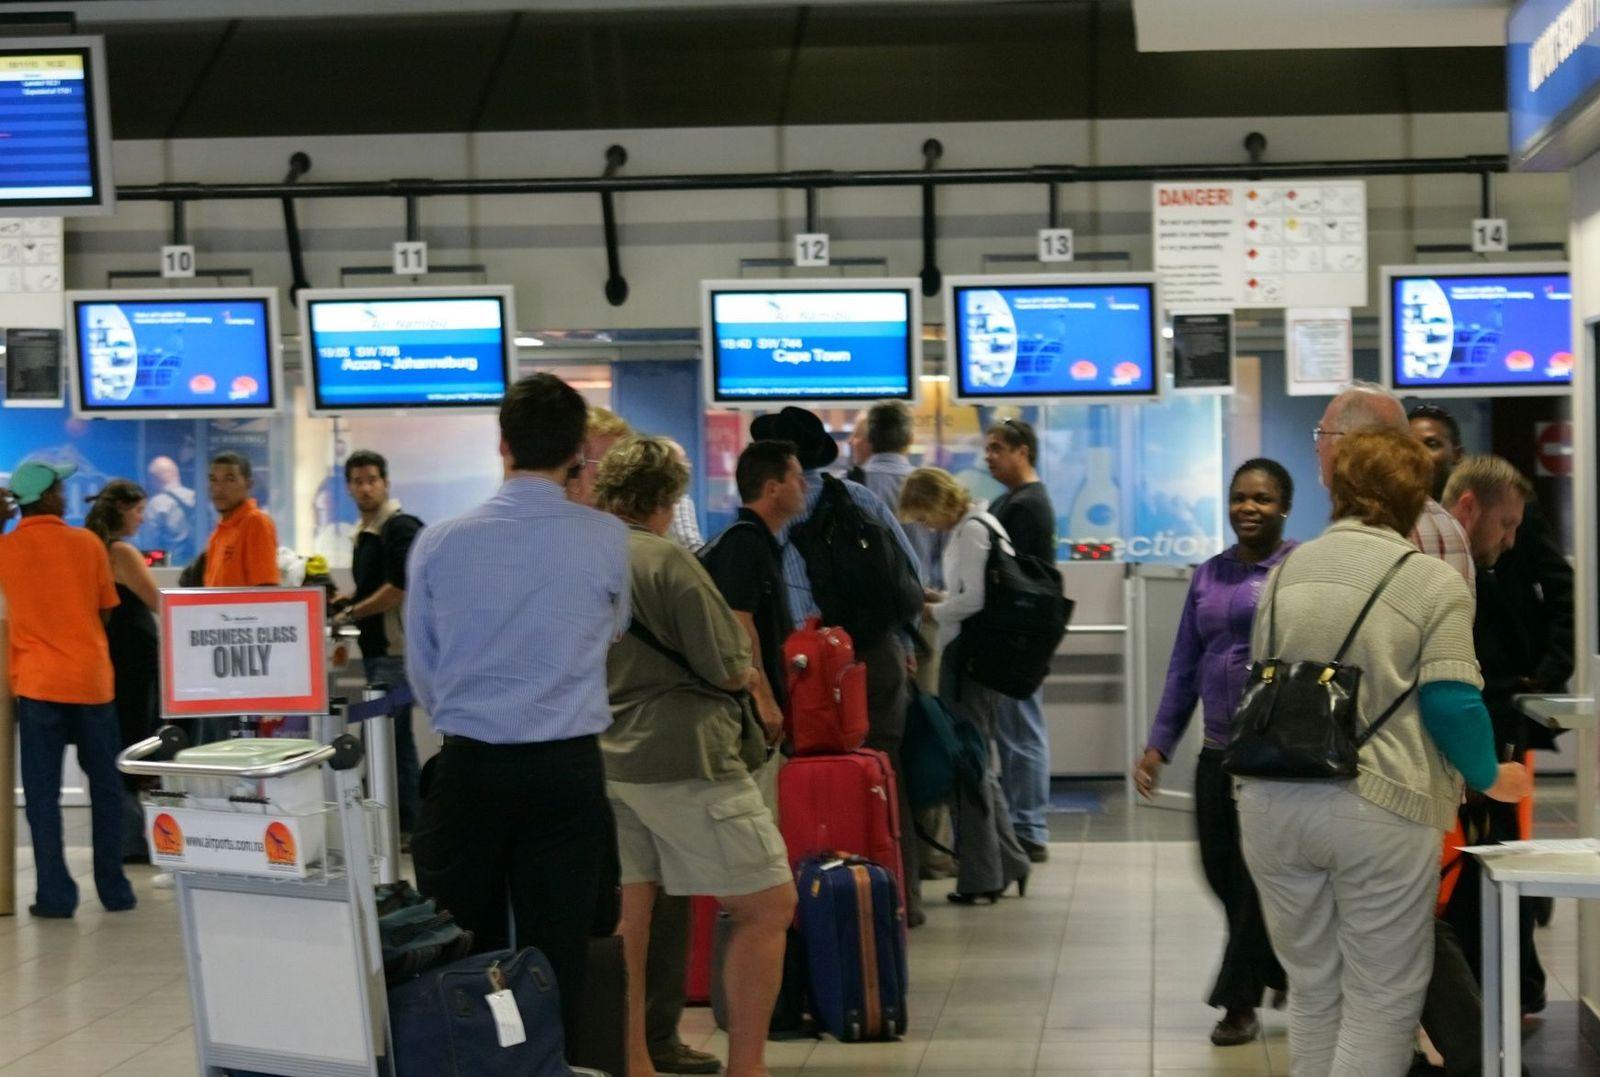 Namibia Flughafen Passagiere Checkin